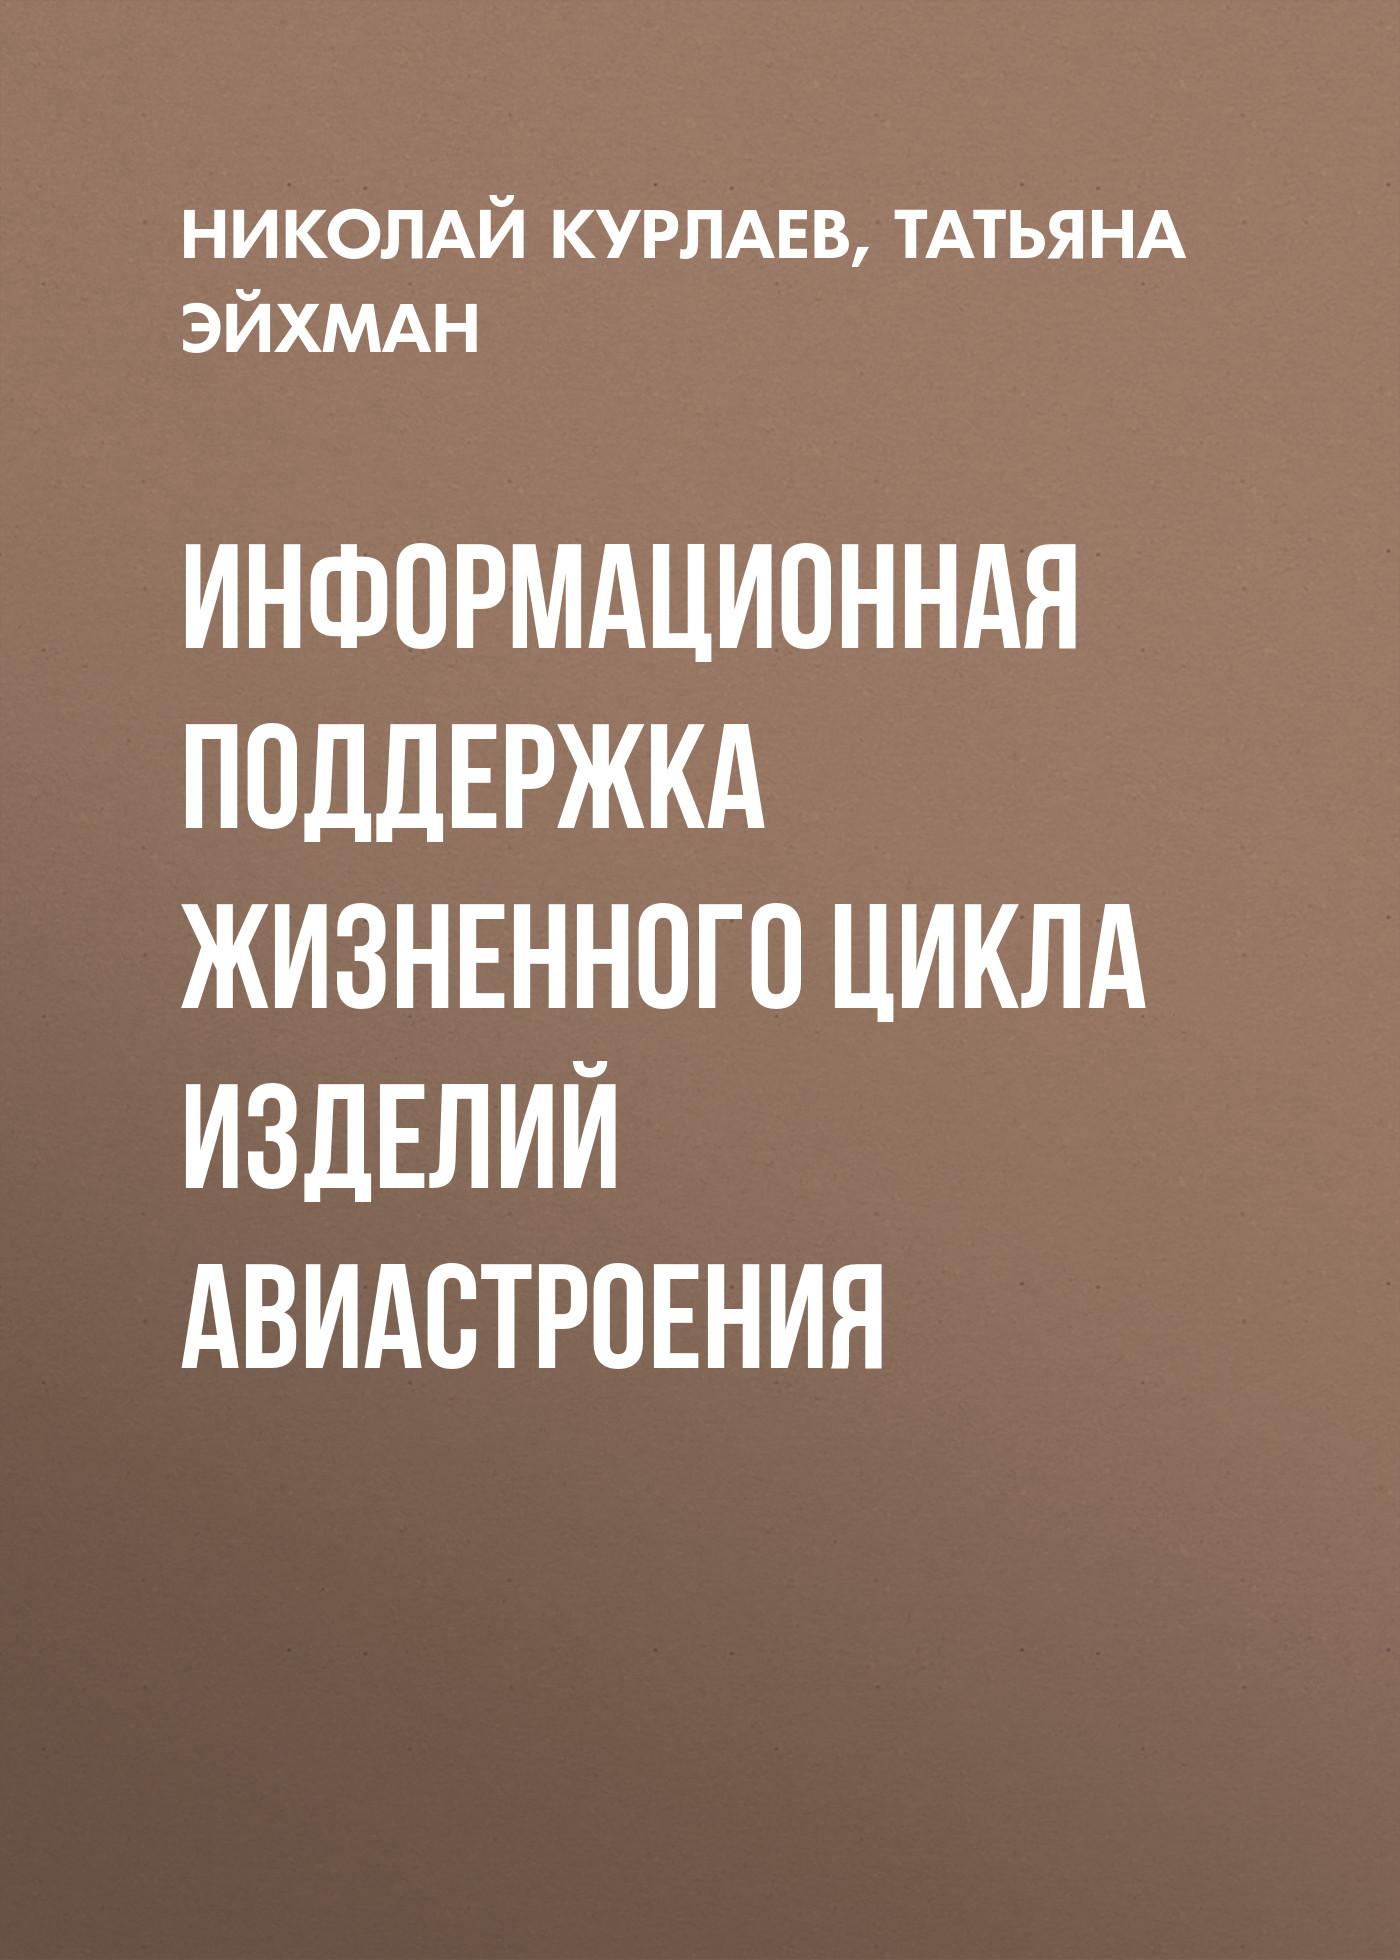 Николай Курлаев бесплатно